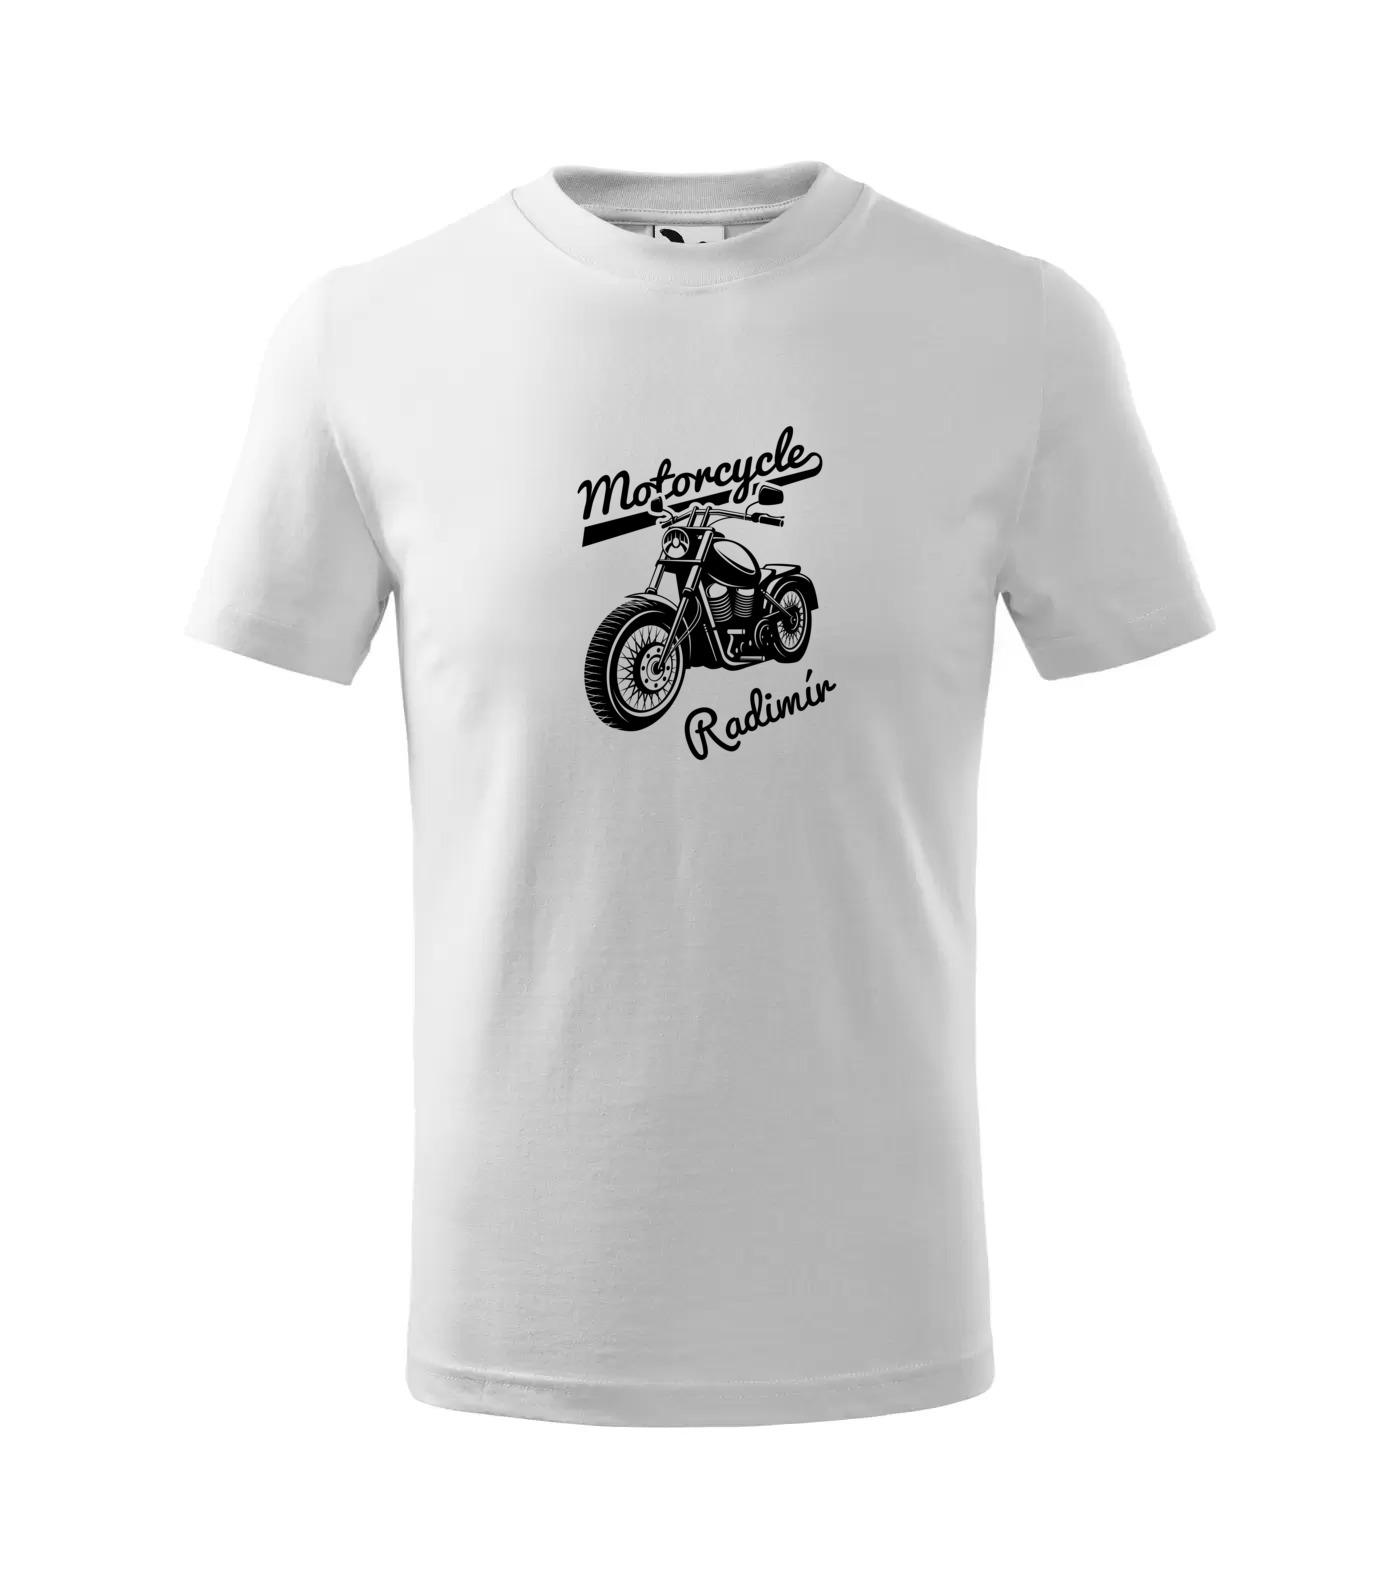 Tričko Motorkář Inverse Radimír